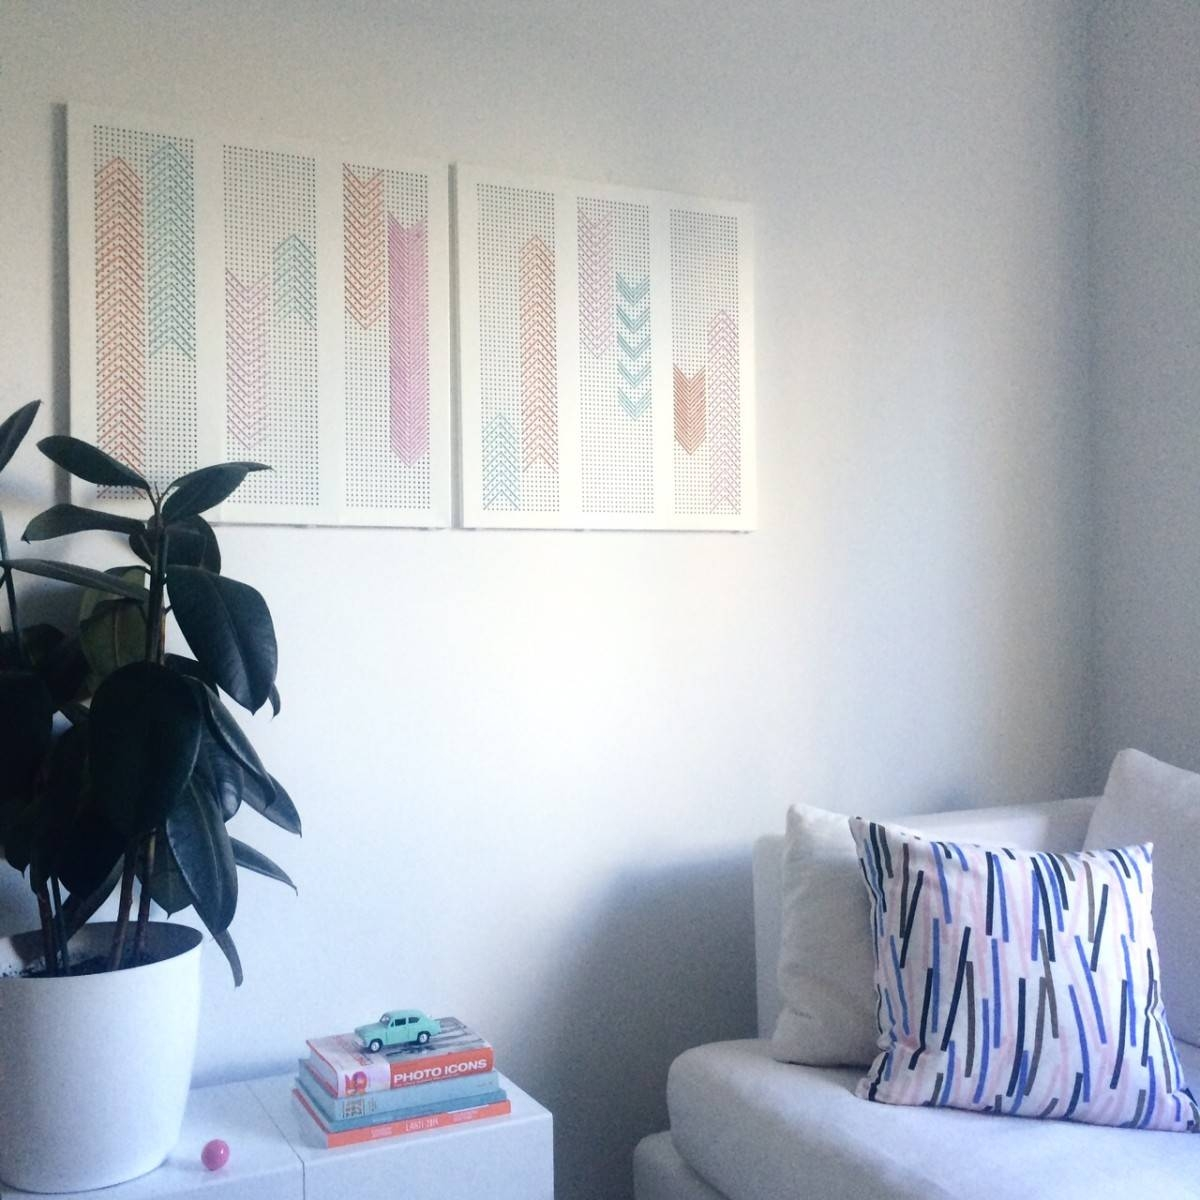 Broken Algot Shelf To Wall Art For Living Room – Ikea Hackers In 2018 Ikea Metal Wall Art (View 15 of 20)